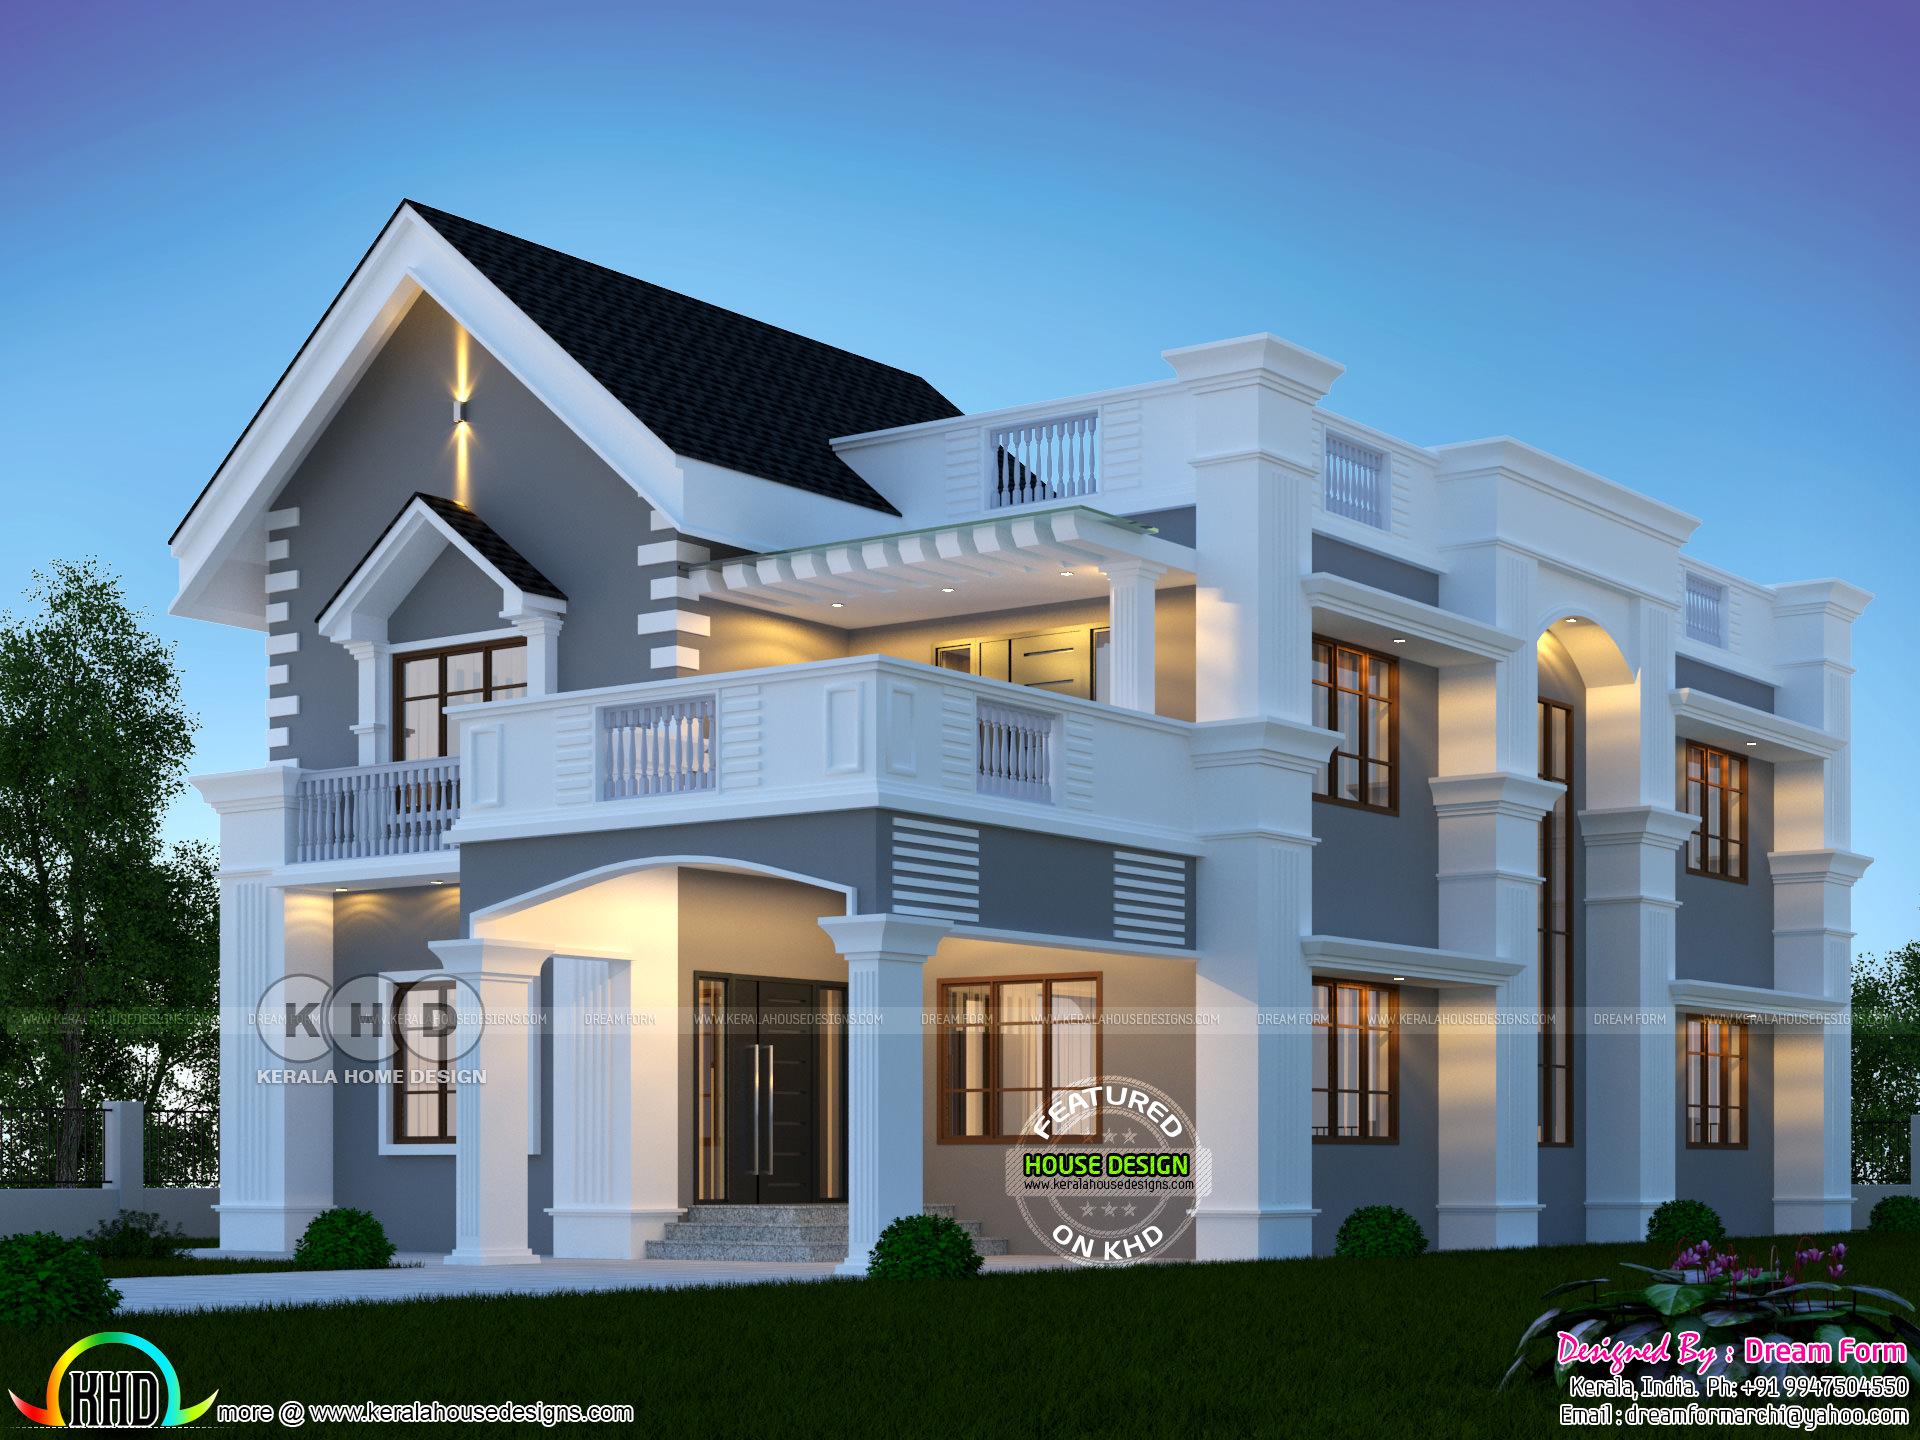 4 Bedroom Mixed Roof Grand Kerala Home Kerala Home Design Bloglovin